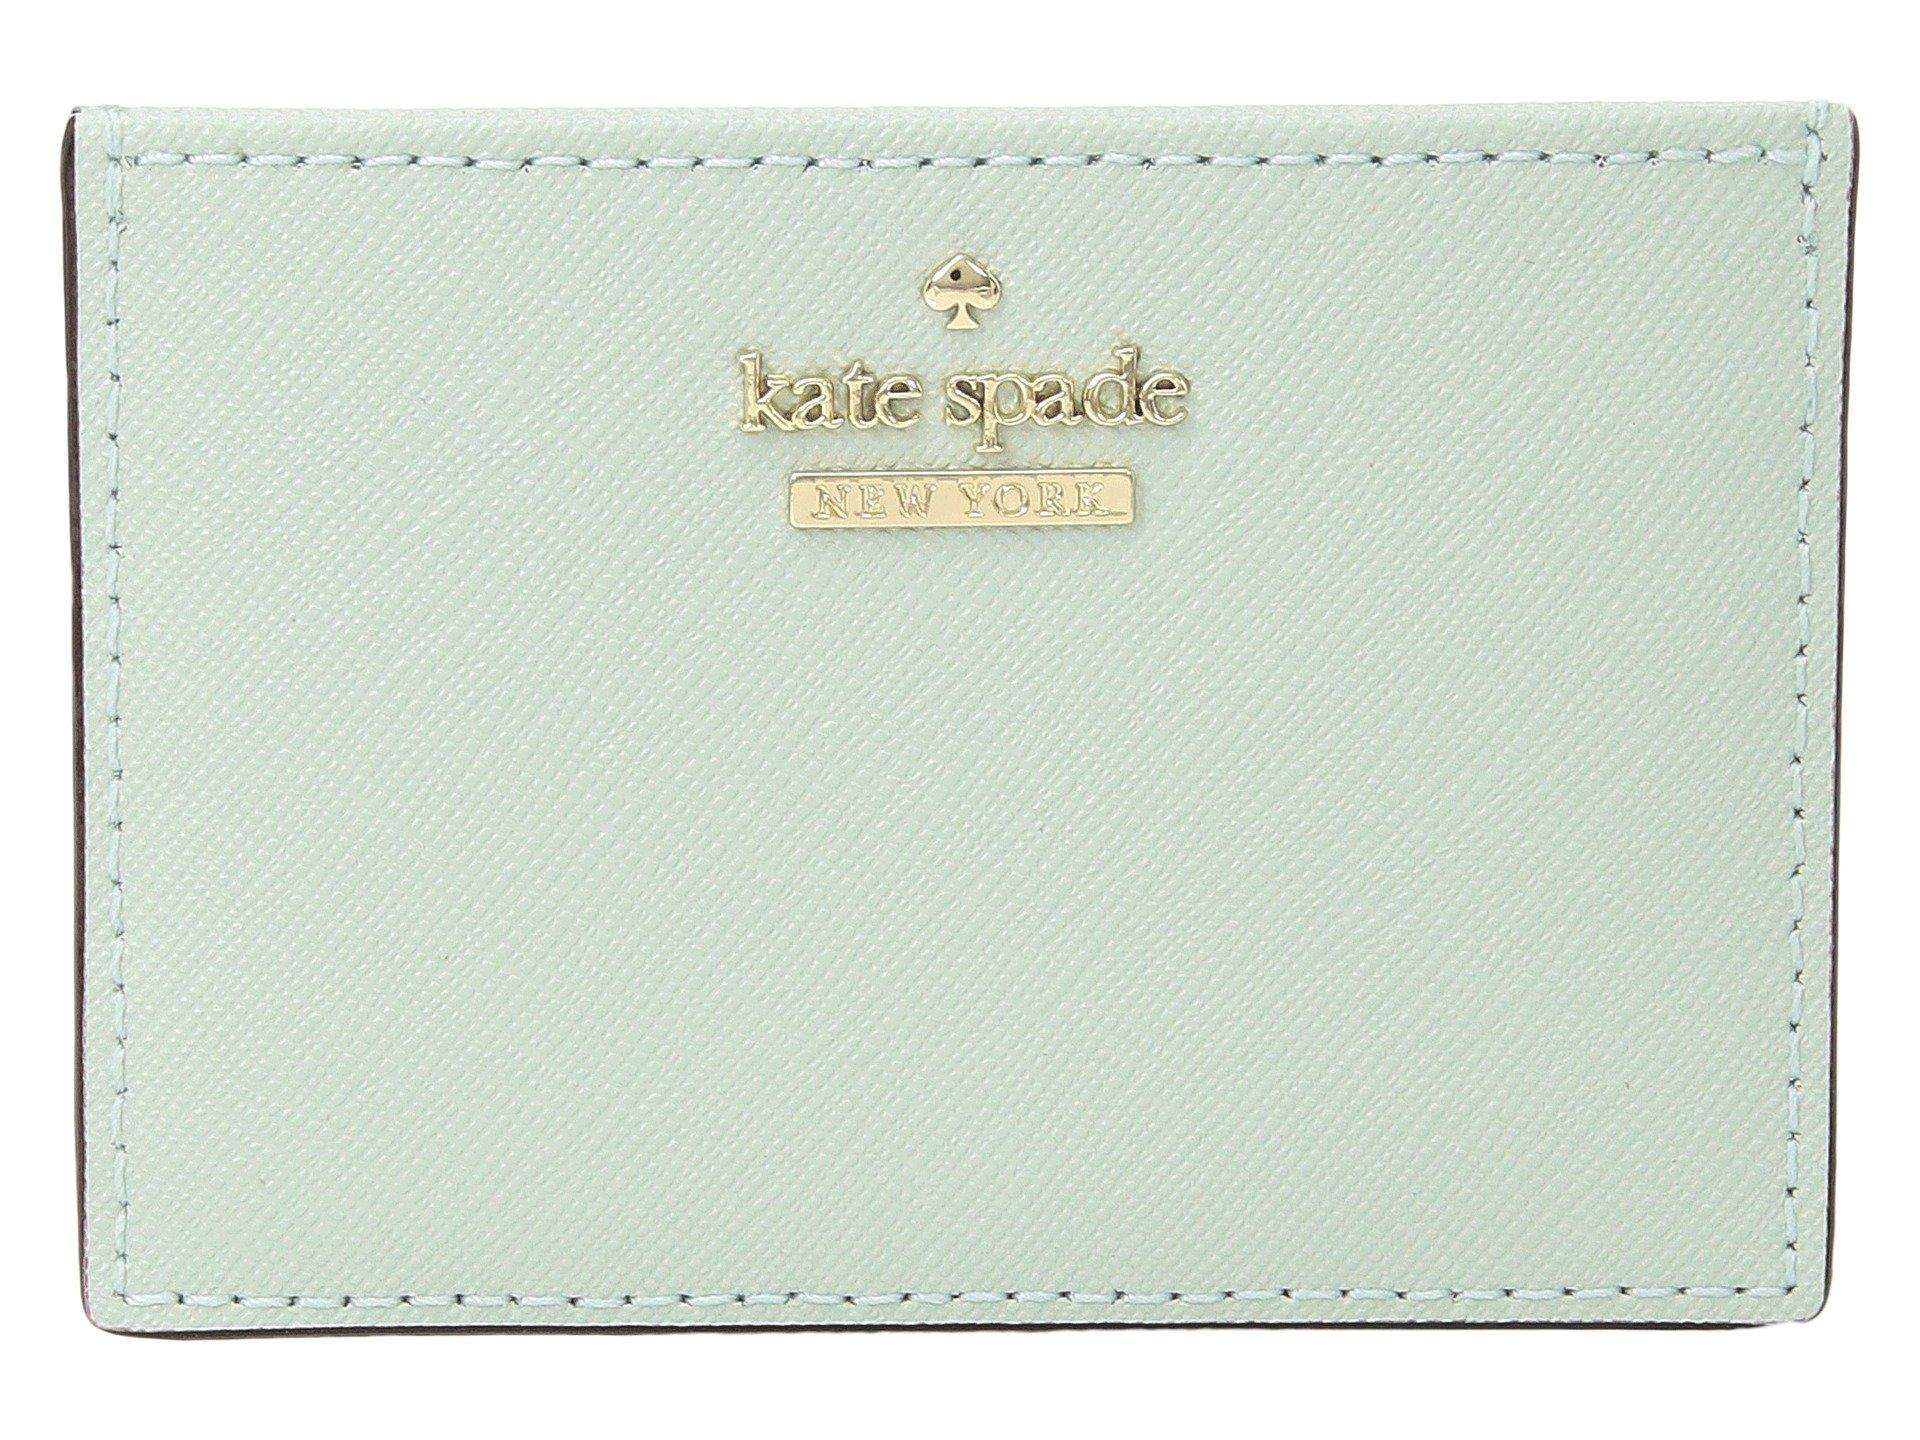 Kate Spade New York Women's Cameron Street Card Holder, Misty Mint, One Size